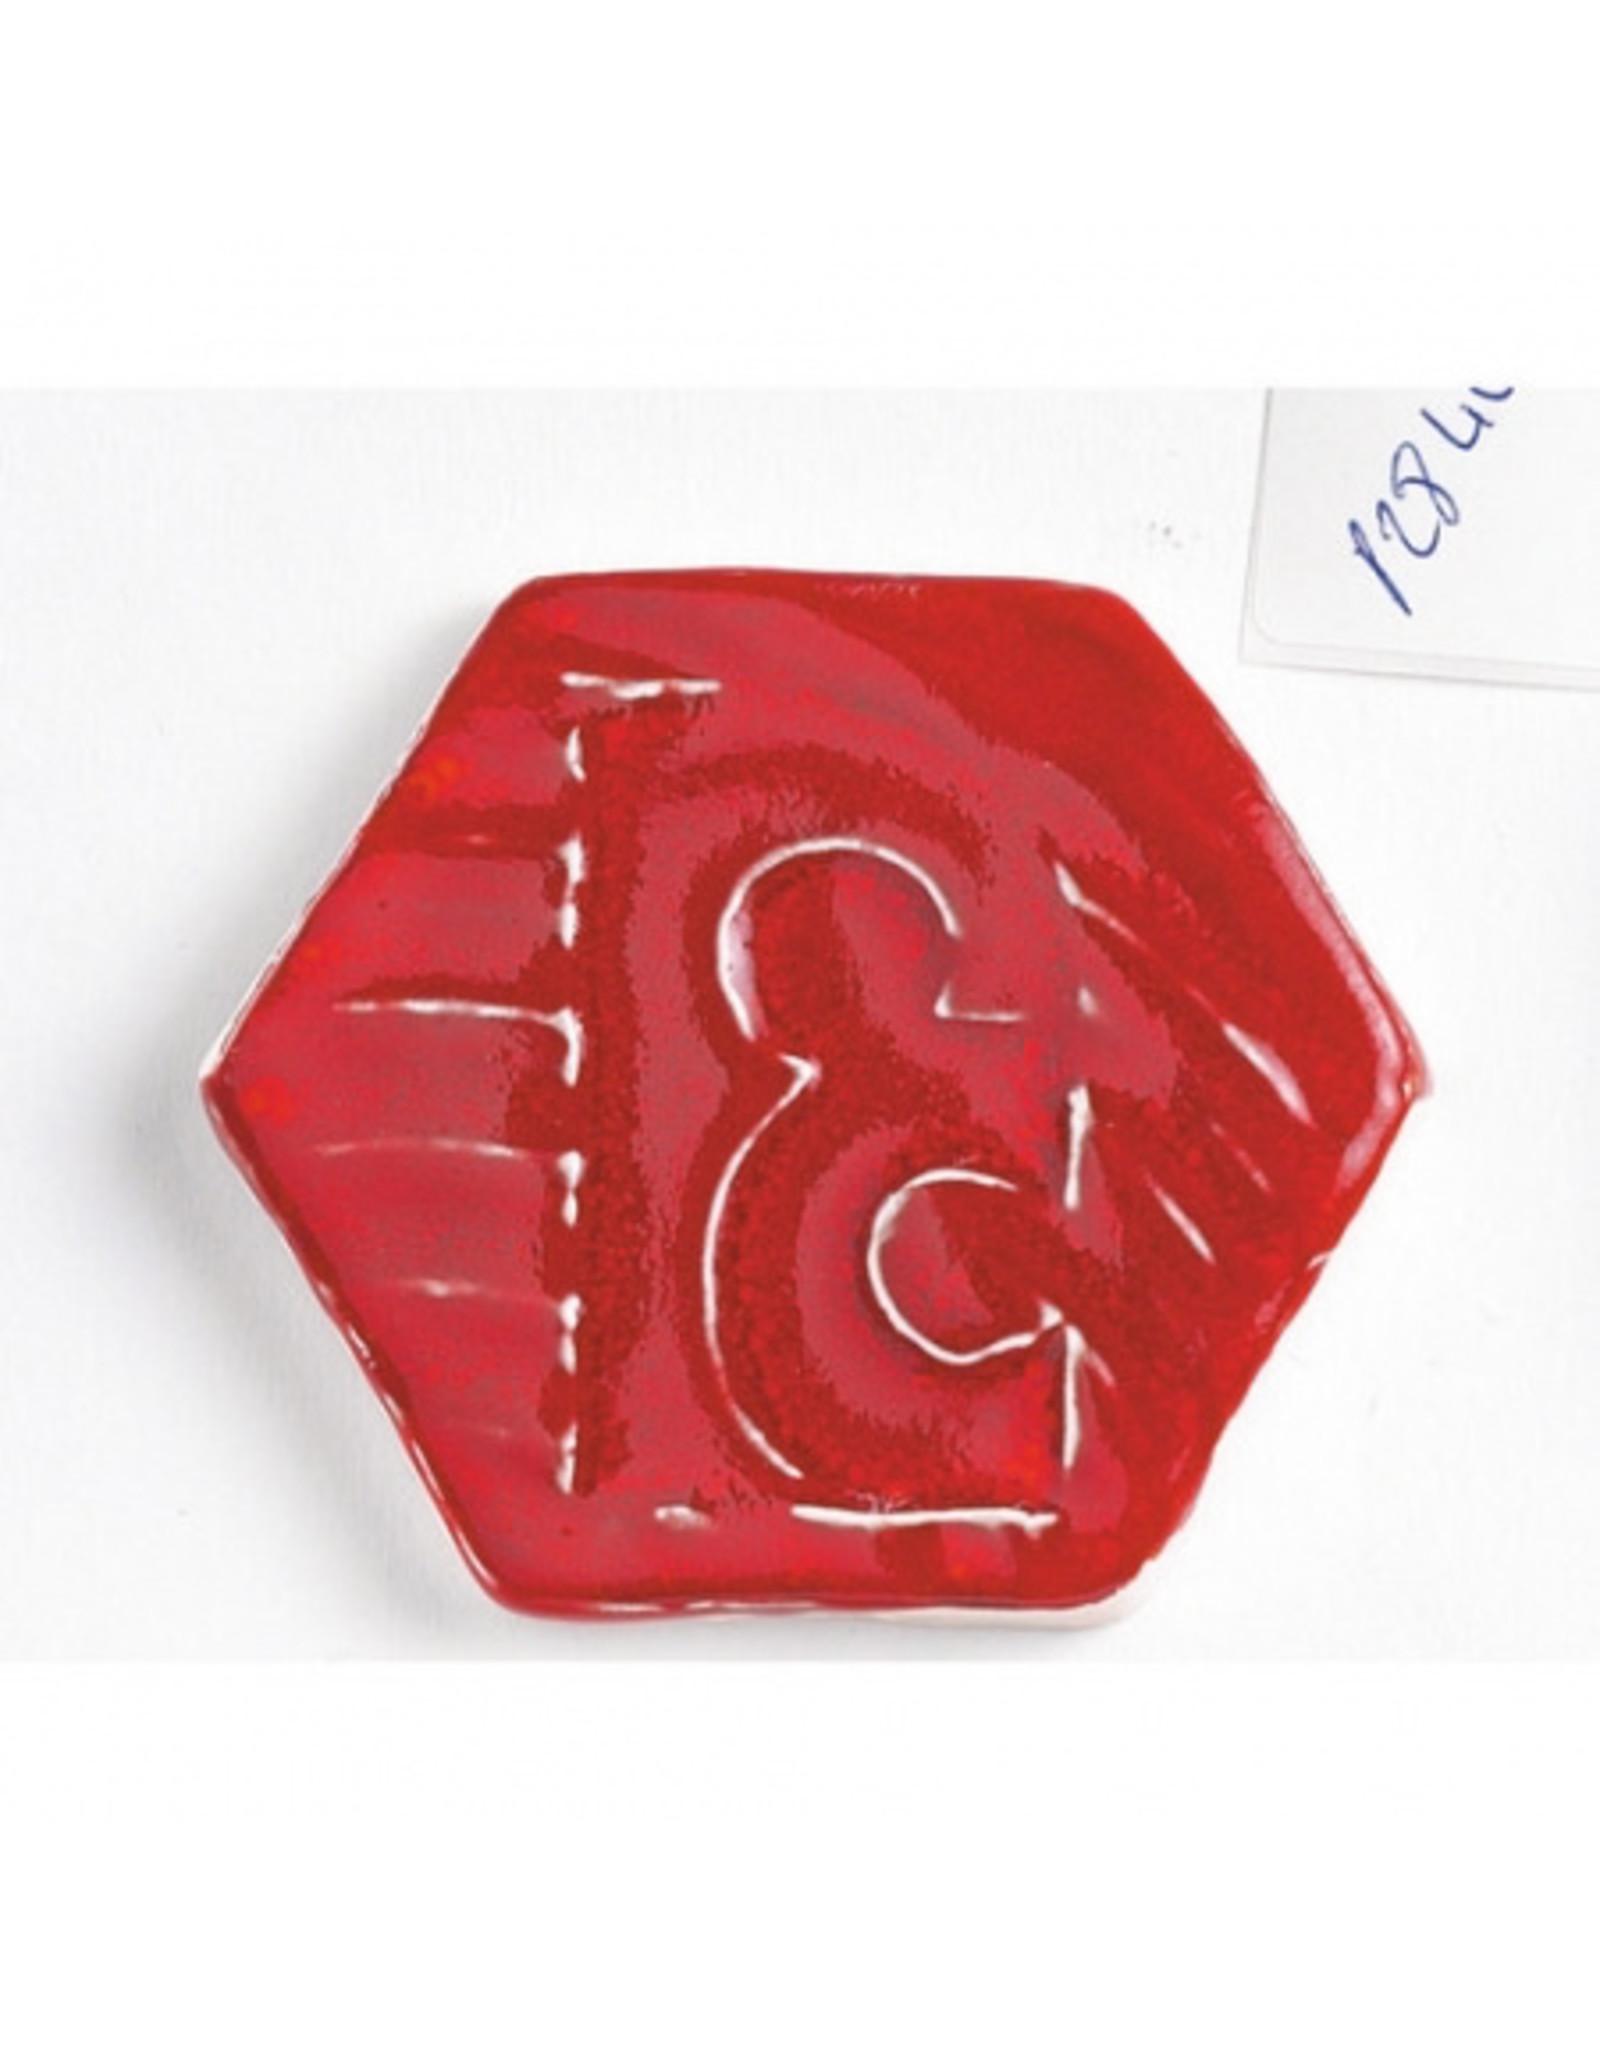 Potterycrafts Brush-on Stoneware Glaze - Red 500ml